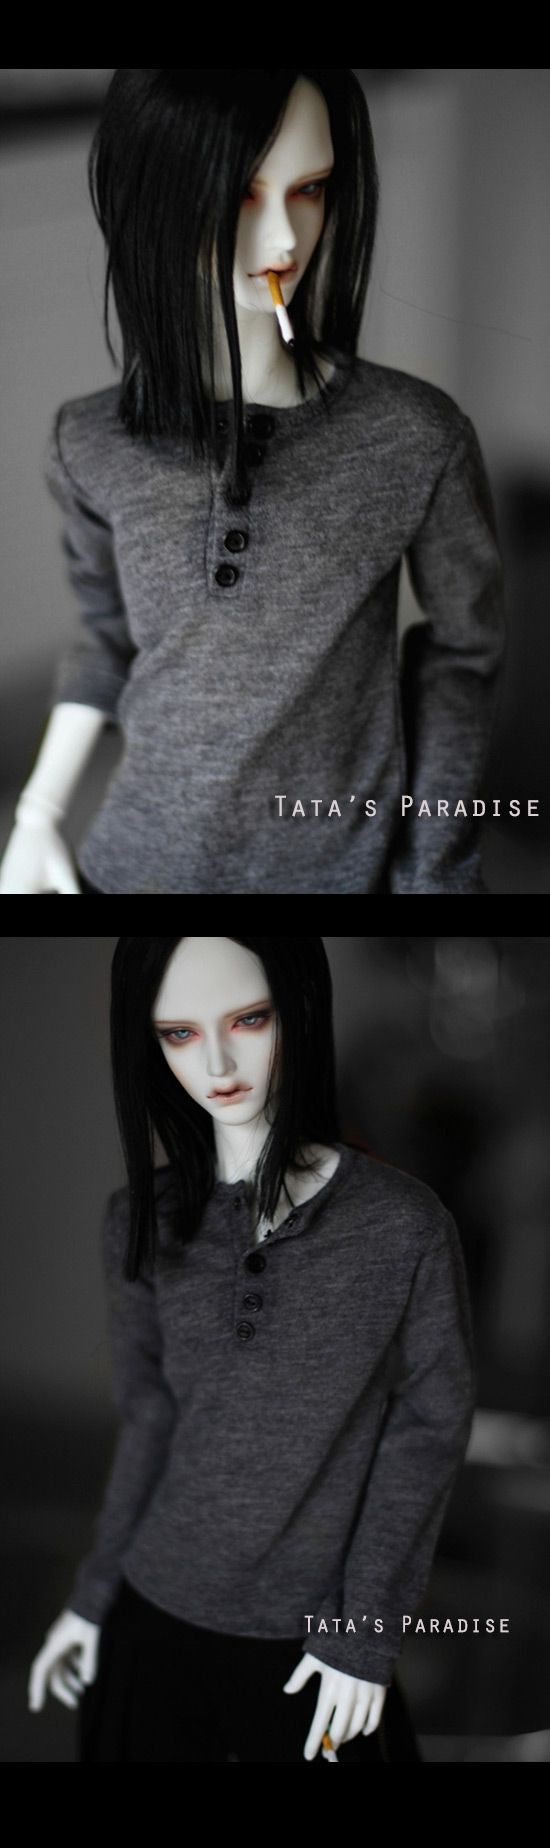 NO:SRT182 Class-Di_HOUND/DZ 70/DOI_TA·CLOTHES_TATA'S PARADISE